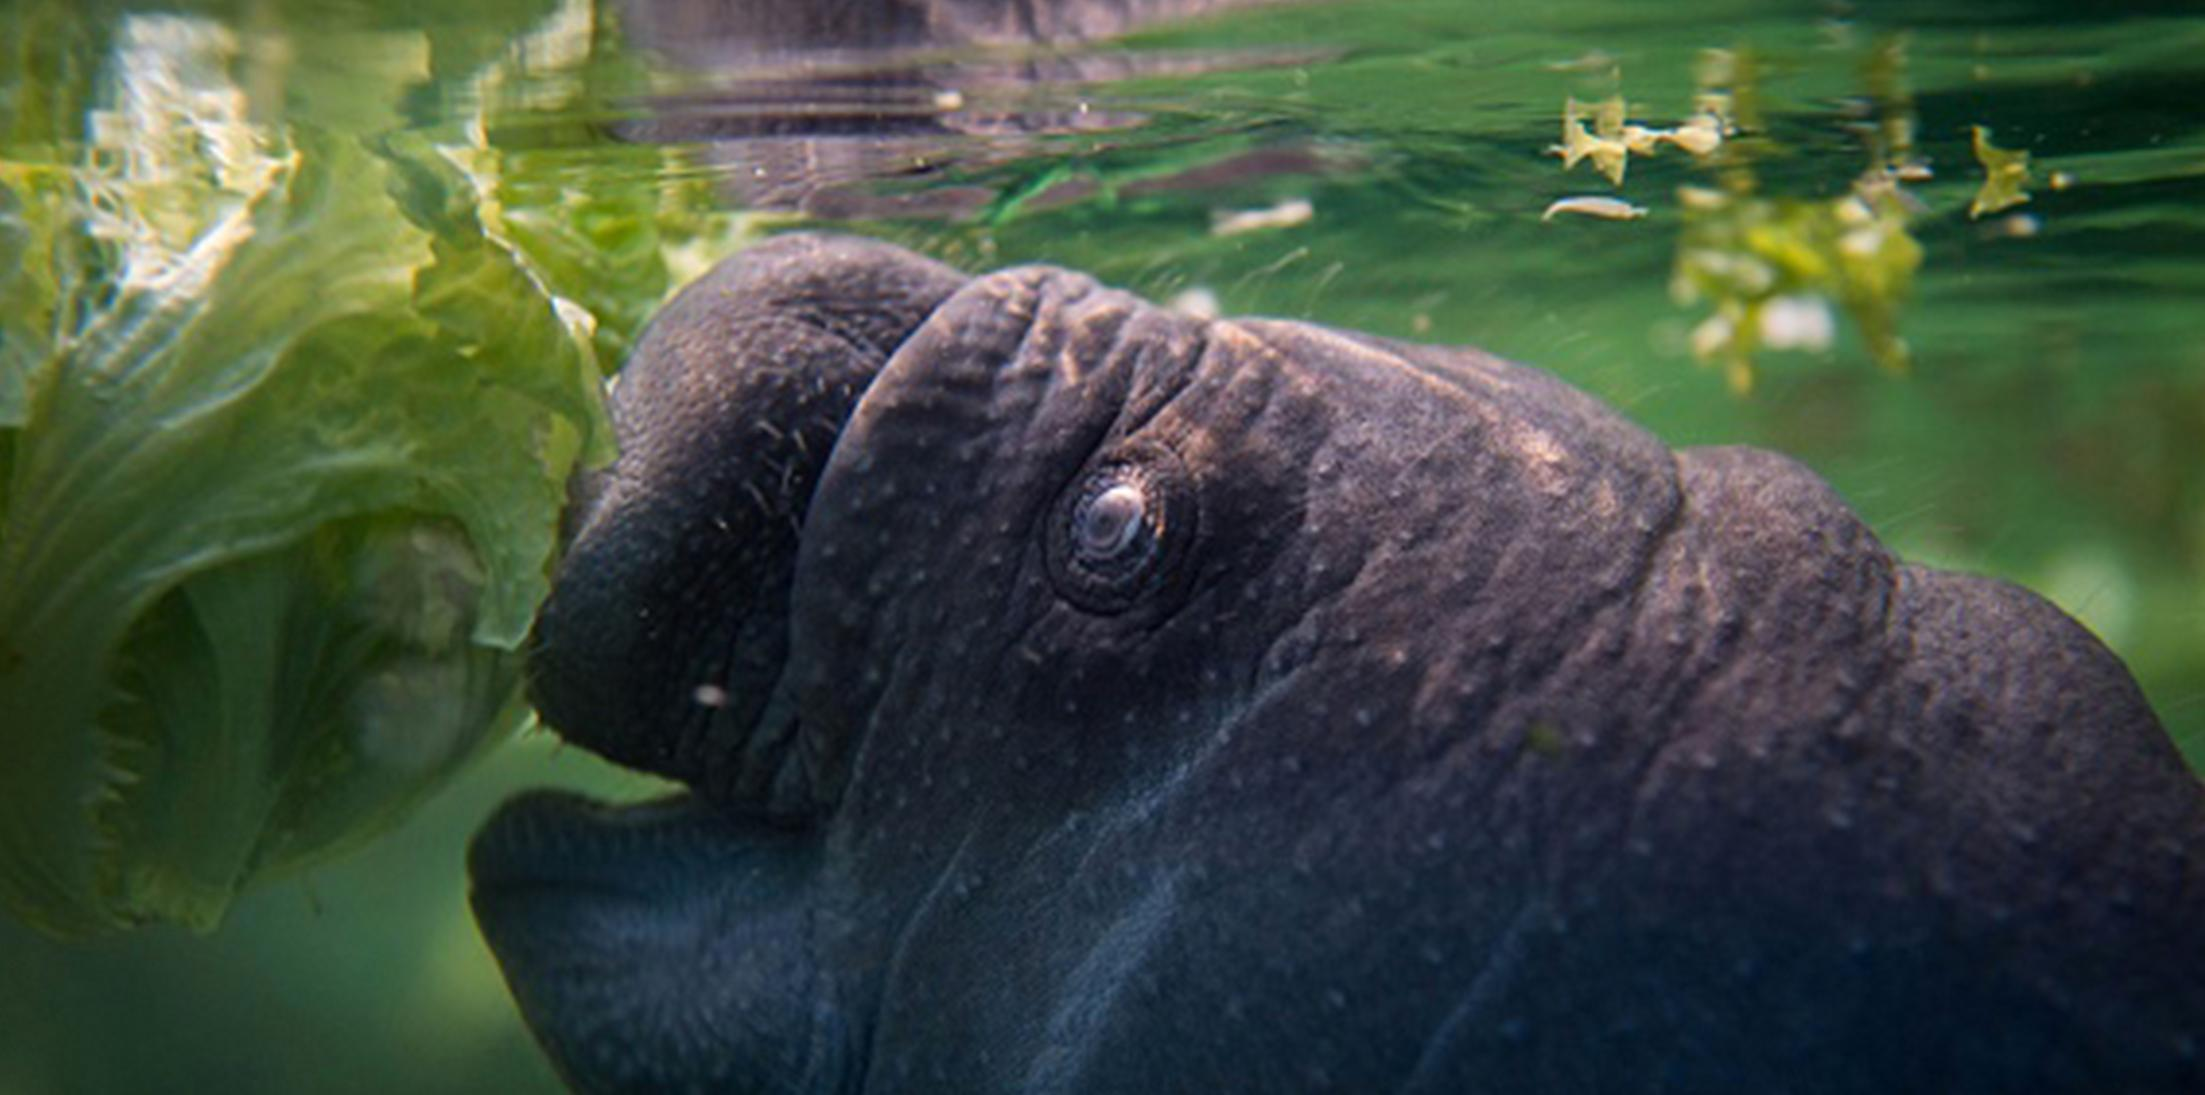 Florida man tortures manatees video feature